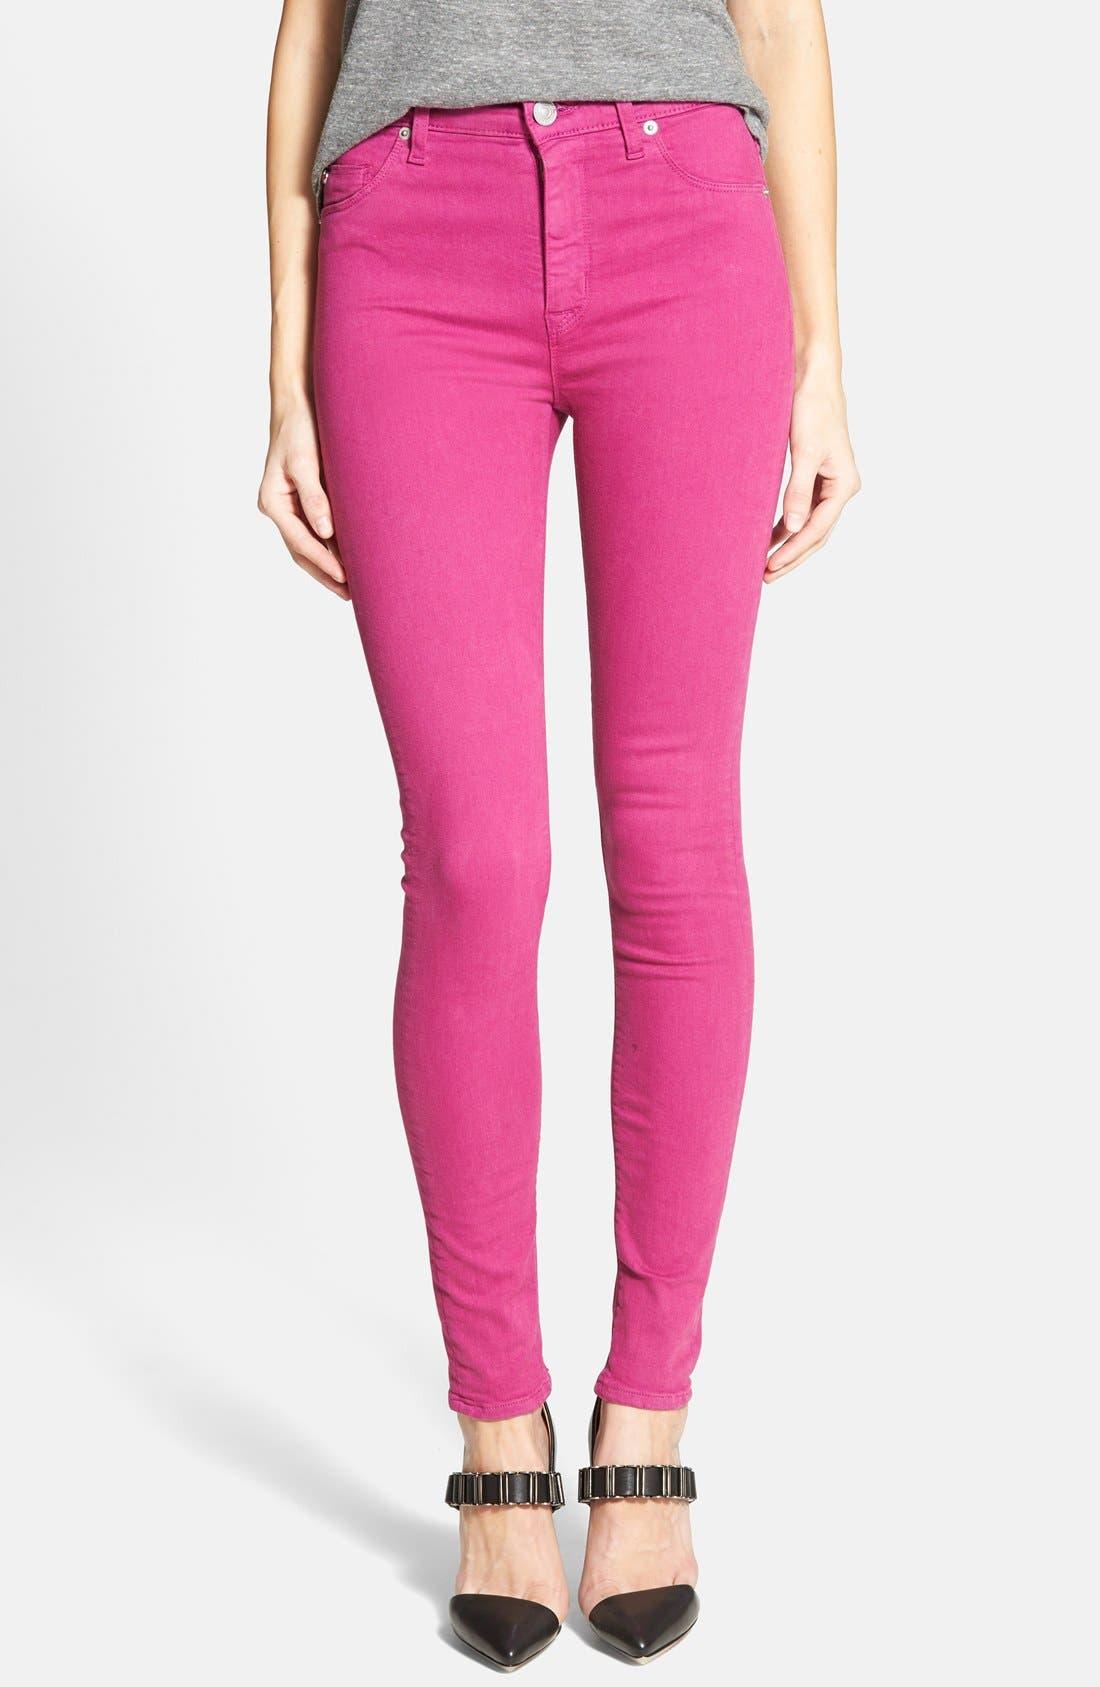 Alternate Image 1 Selected - Hudson Jeans 'Krista' Super Skinny Jeans (Bright Hydrangea)